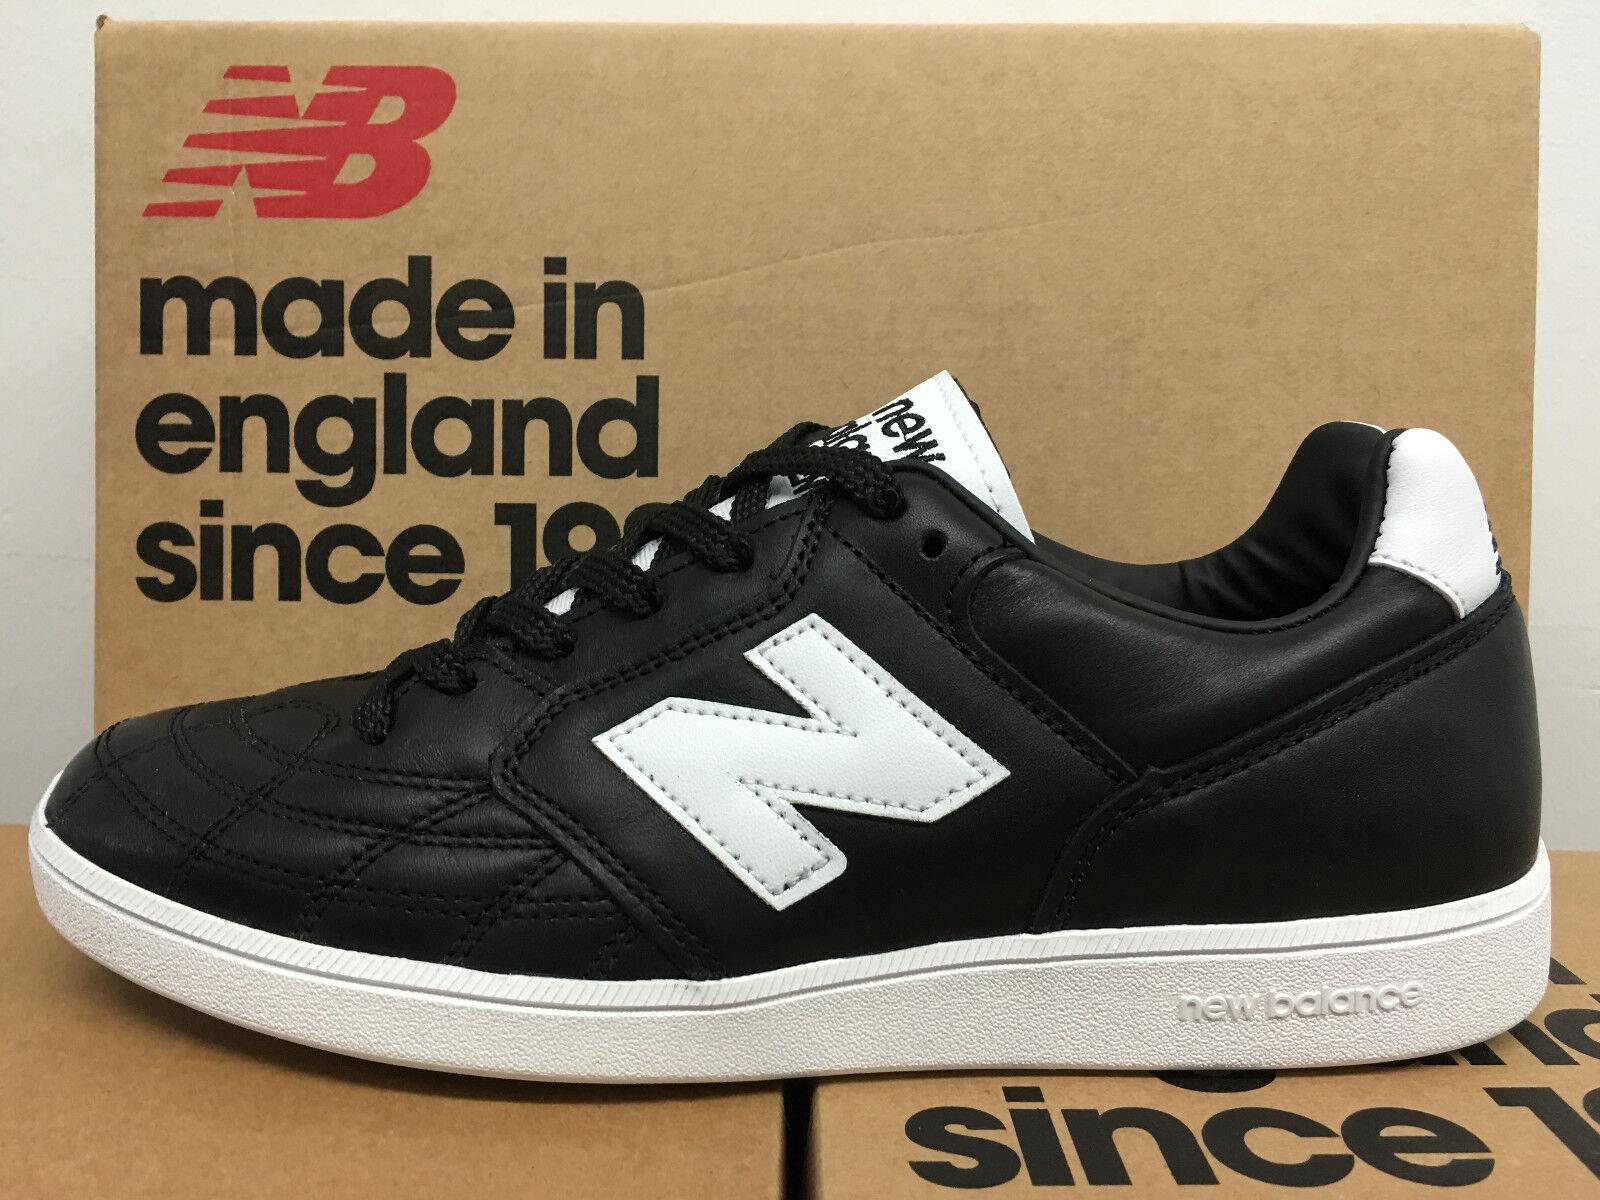 New Balance Football Pack Made England Epic TRFB 7.5-12  574 997 574 rf grenson